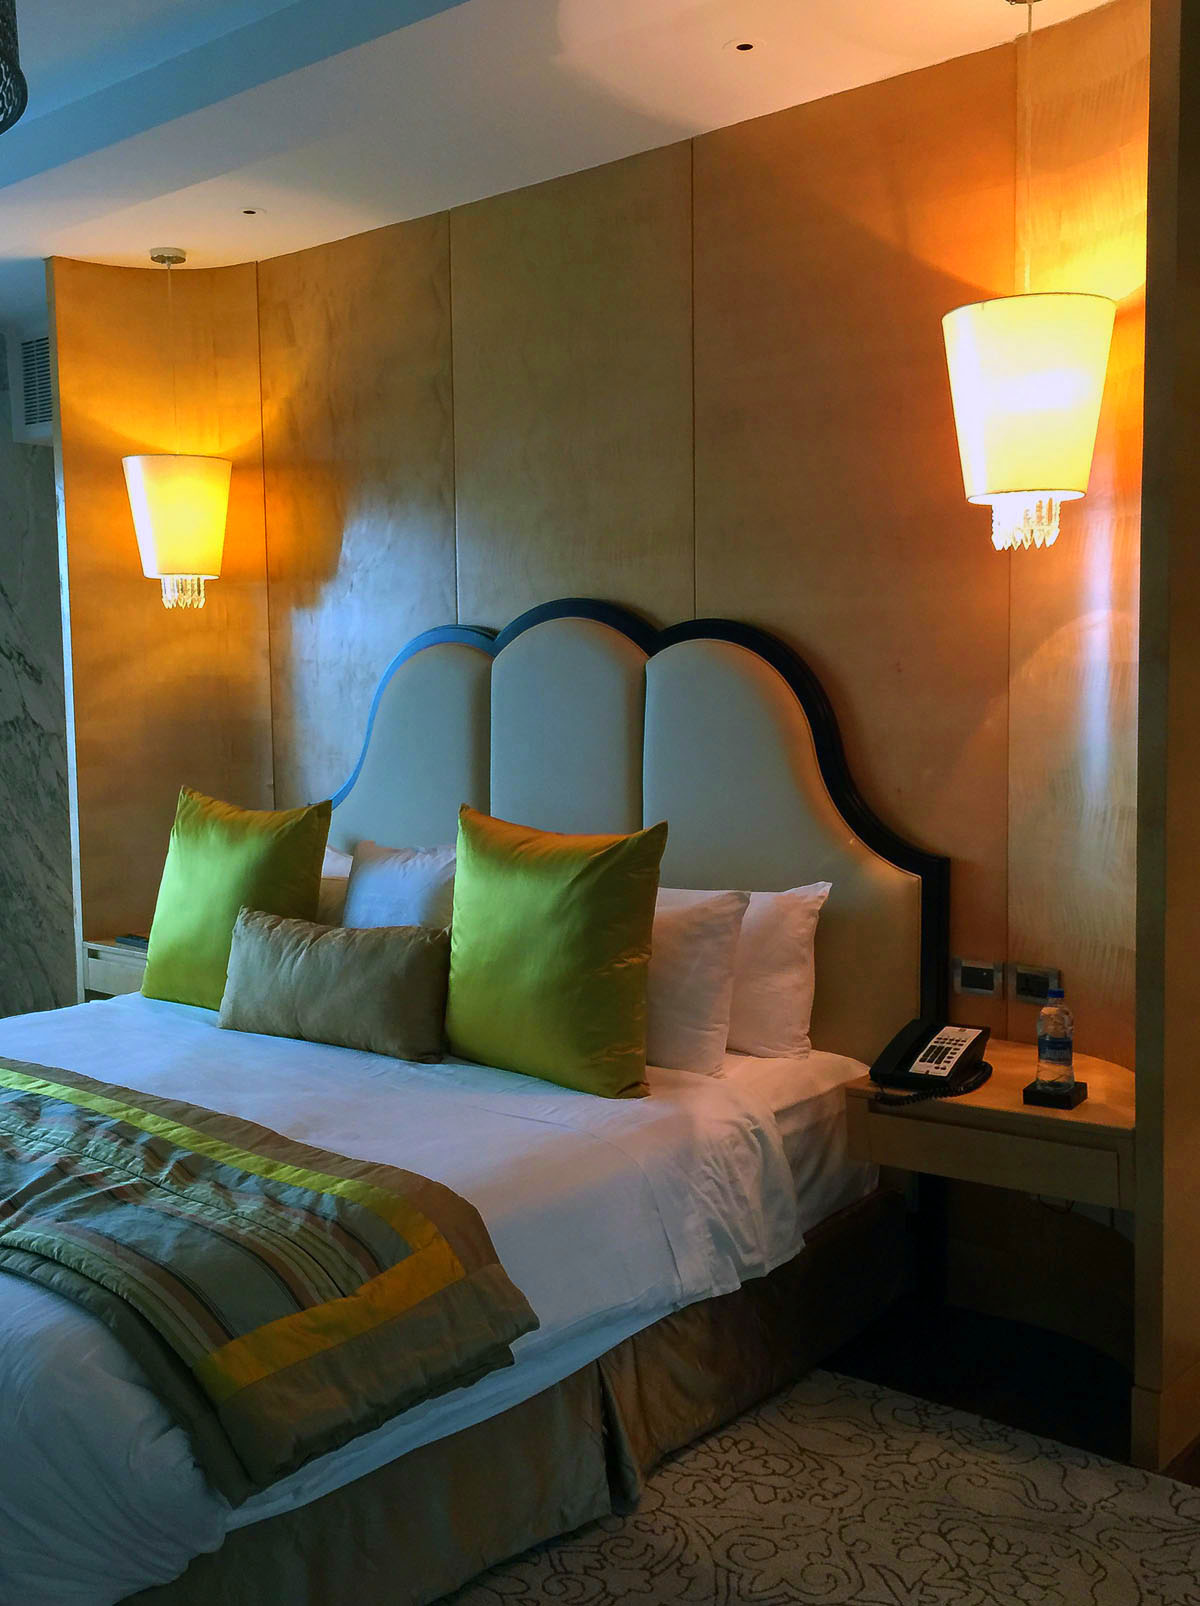 INDIEN_ITC_Grand_Chola_Hotel_Chennai_FINEST-onTour_1888.jpg